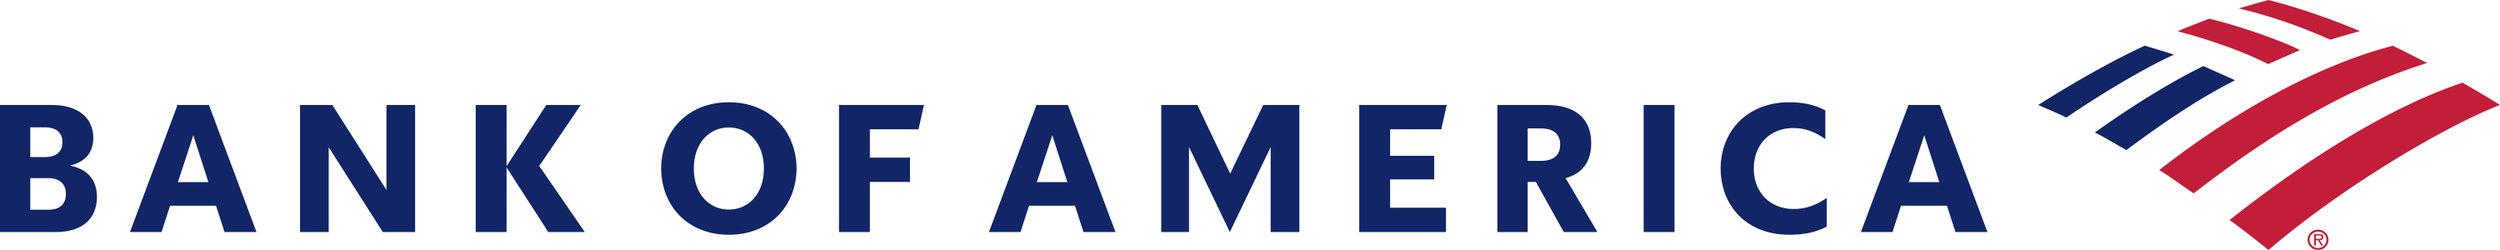 BofA Color Logo.jpg